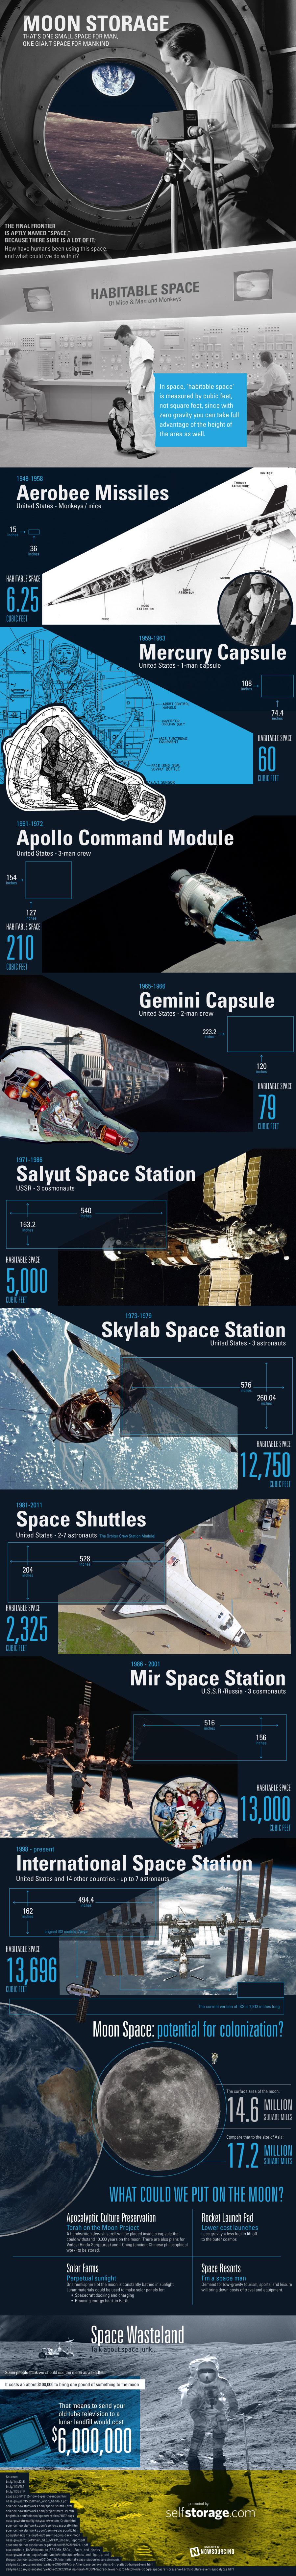 Moon Storage